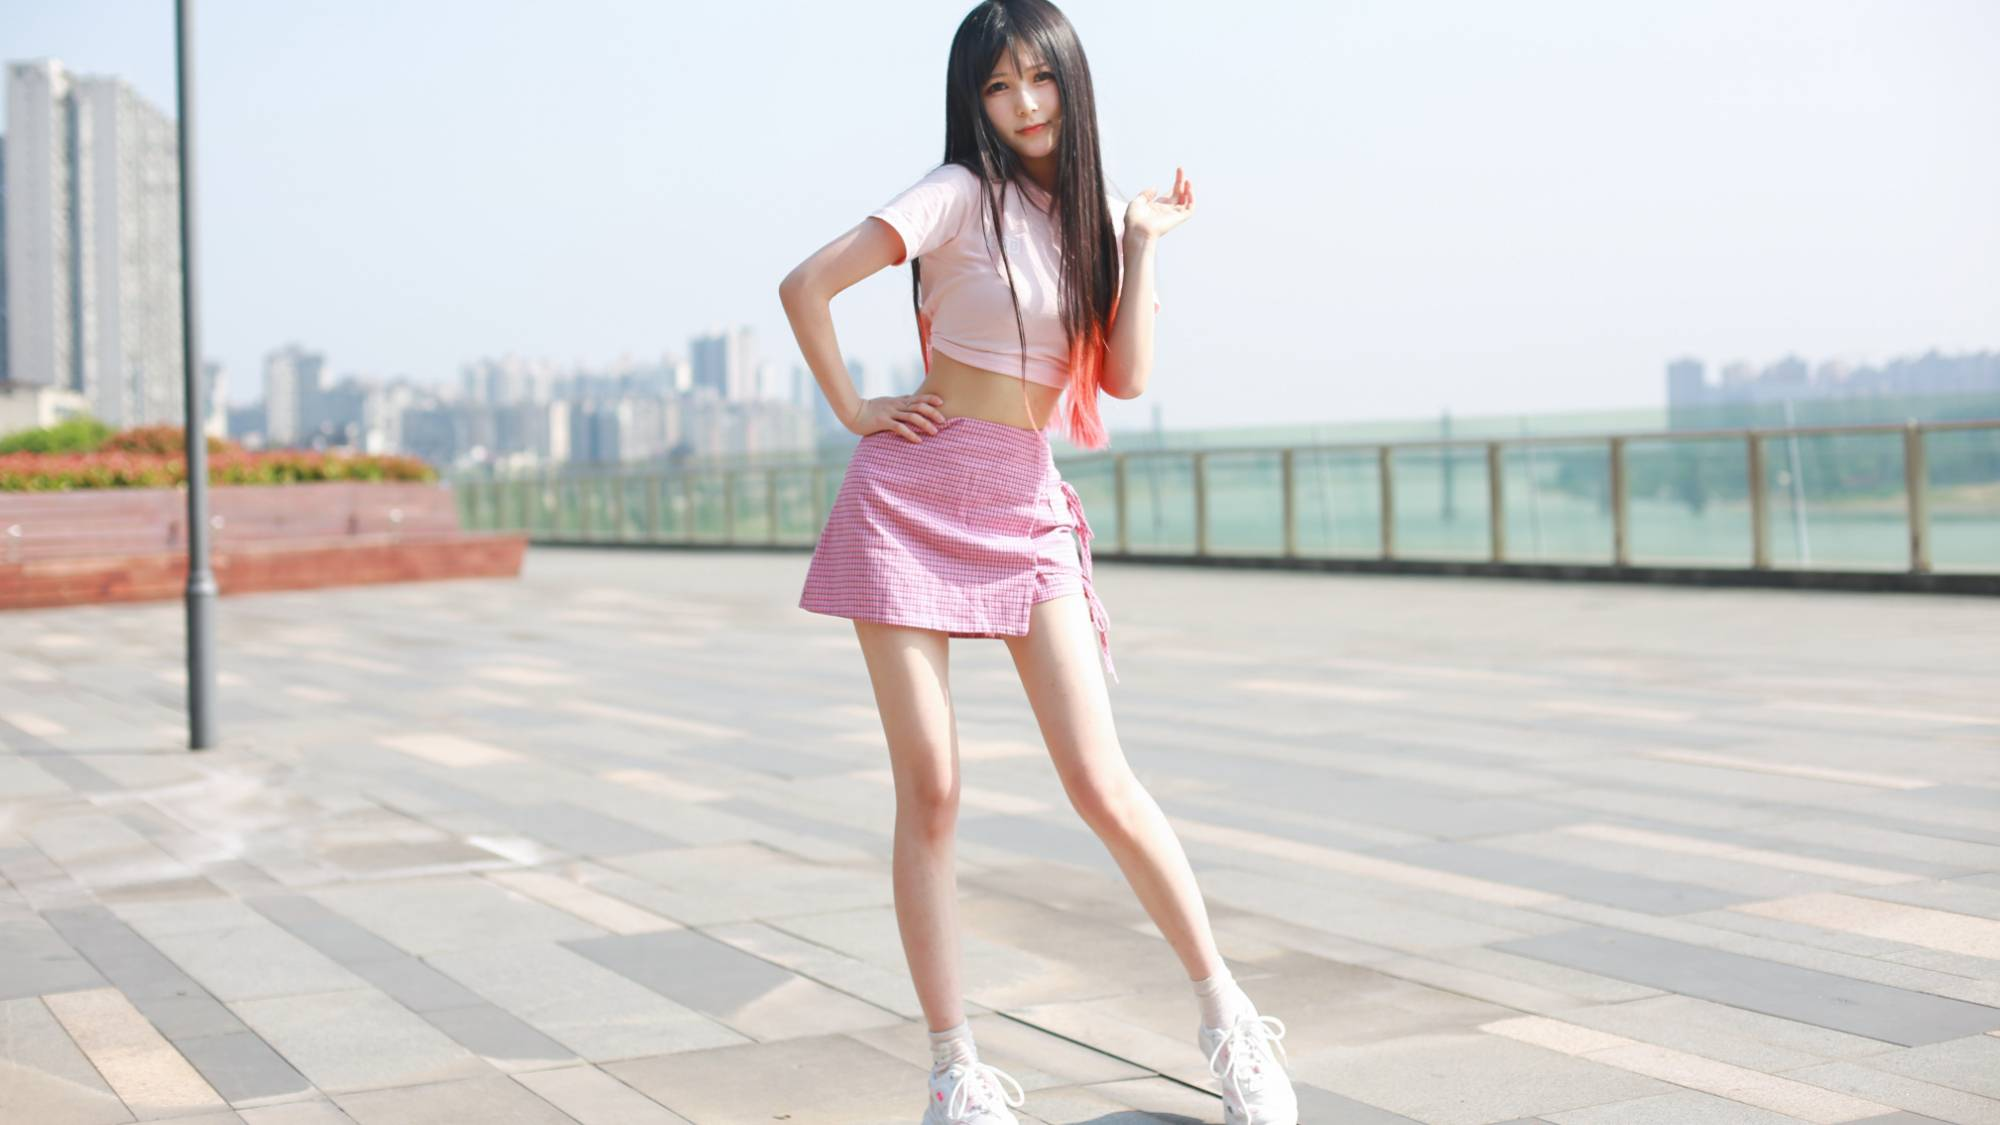 【伊伊】超甜小姐姐元气翻跳 what is love?